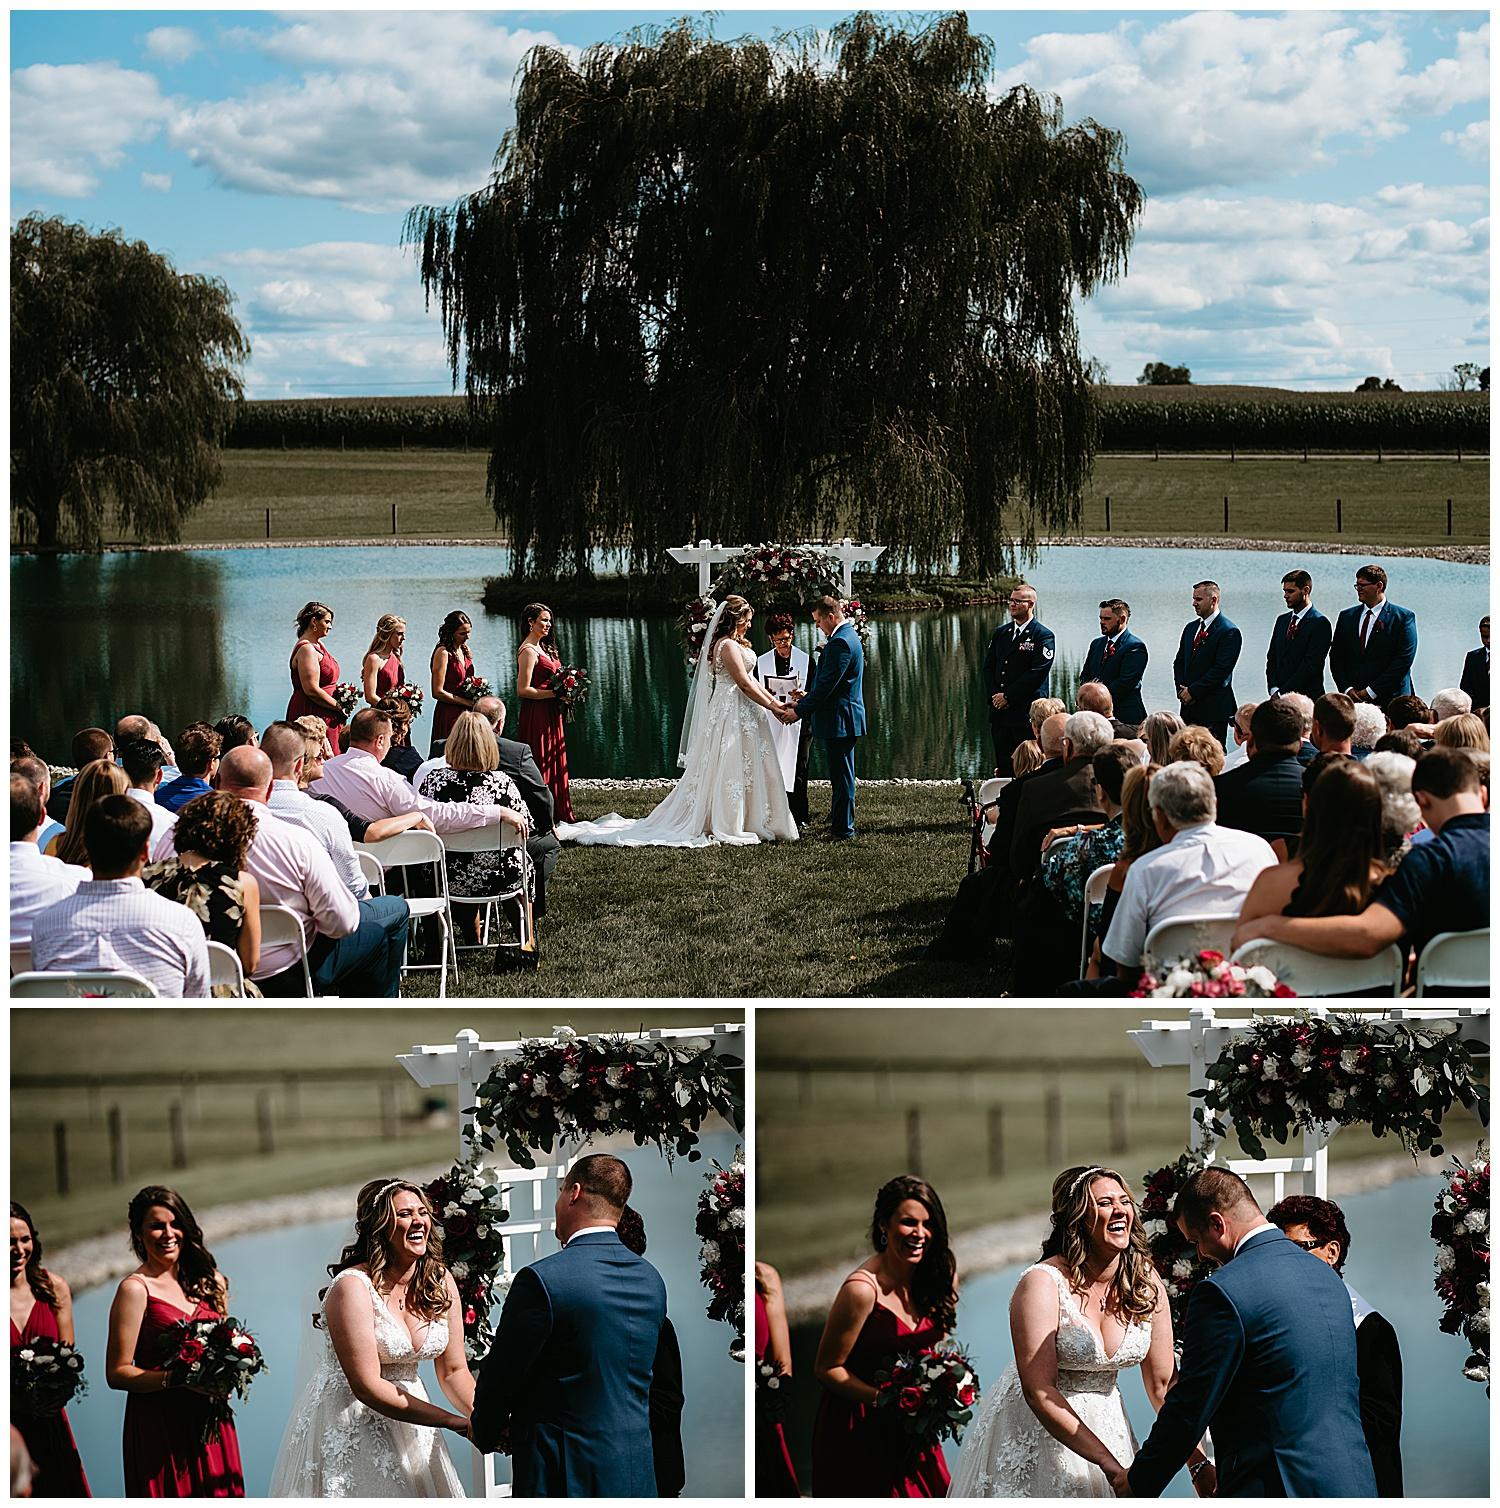 NEPA-Bloomgsburg-Wedding-Photographer-at-The-Barn-at-Greystone-Farms-Watsontown-PA_0070.jpg